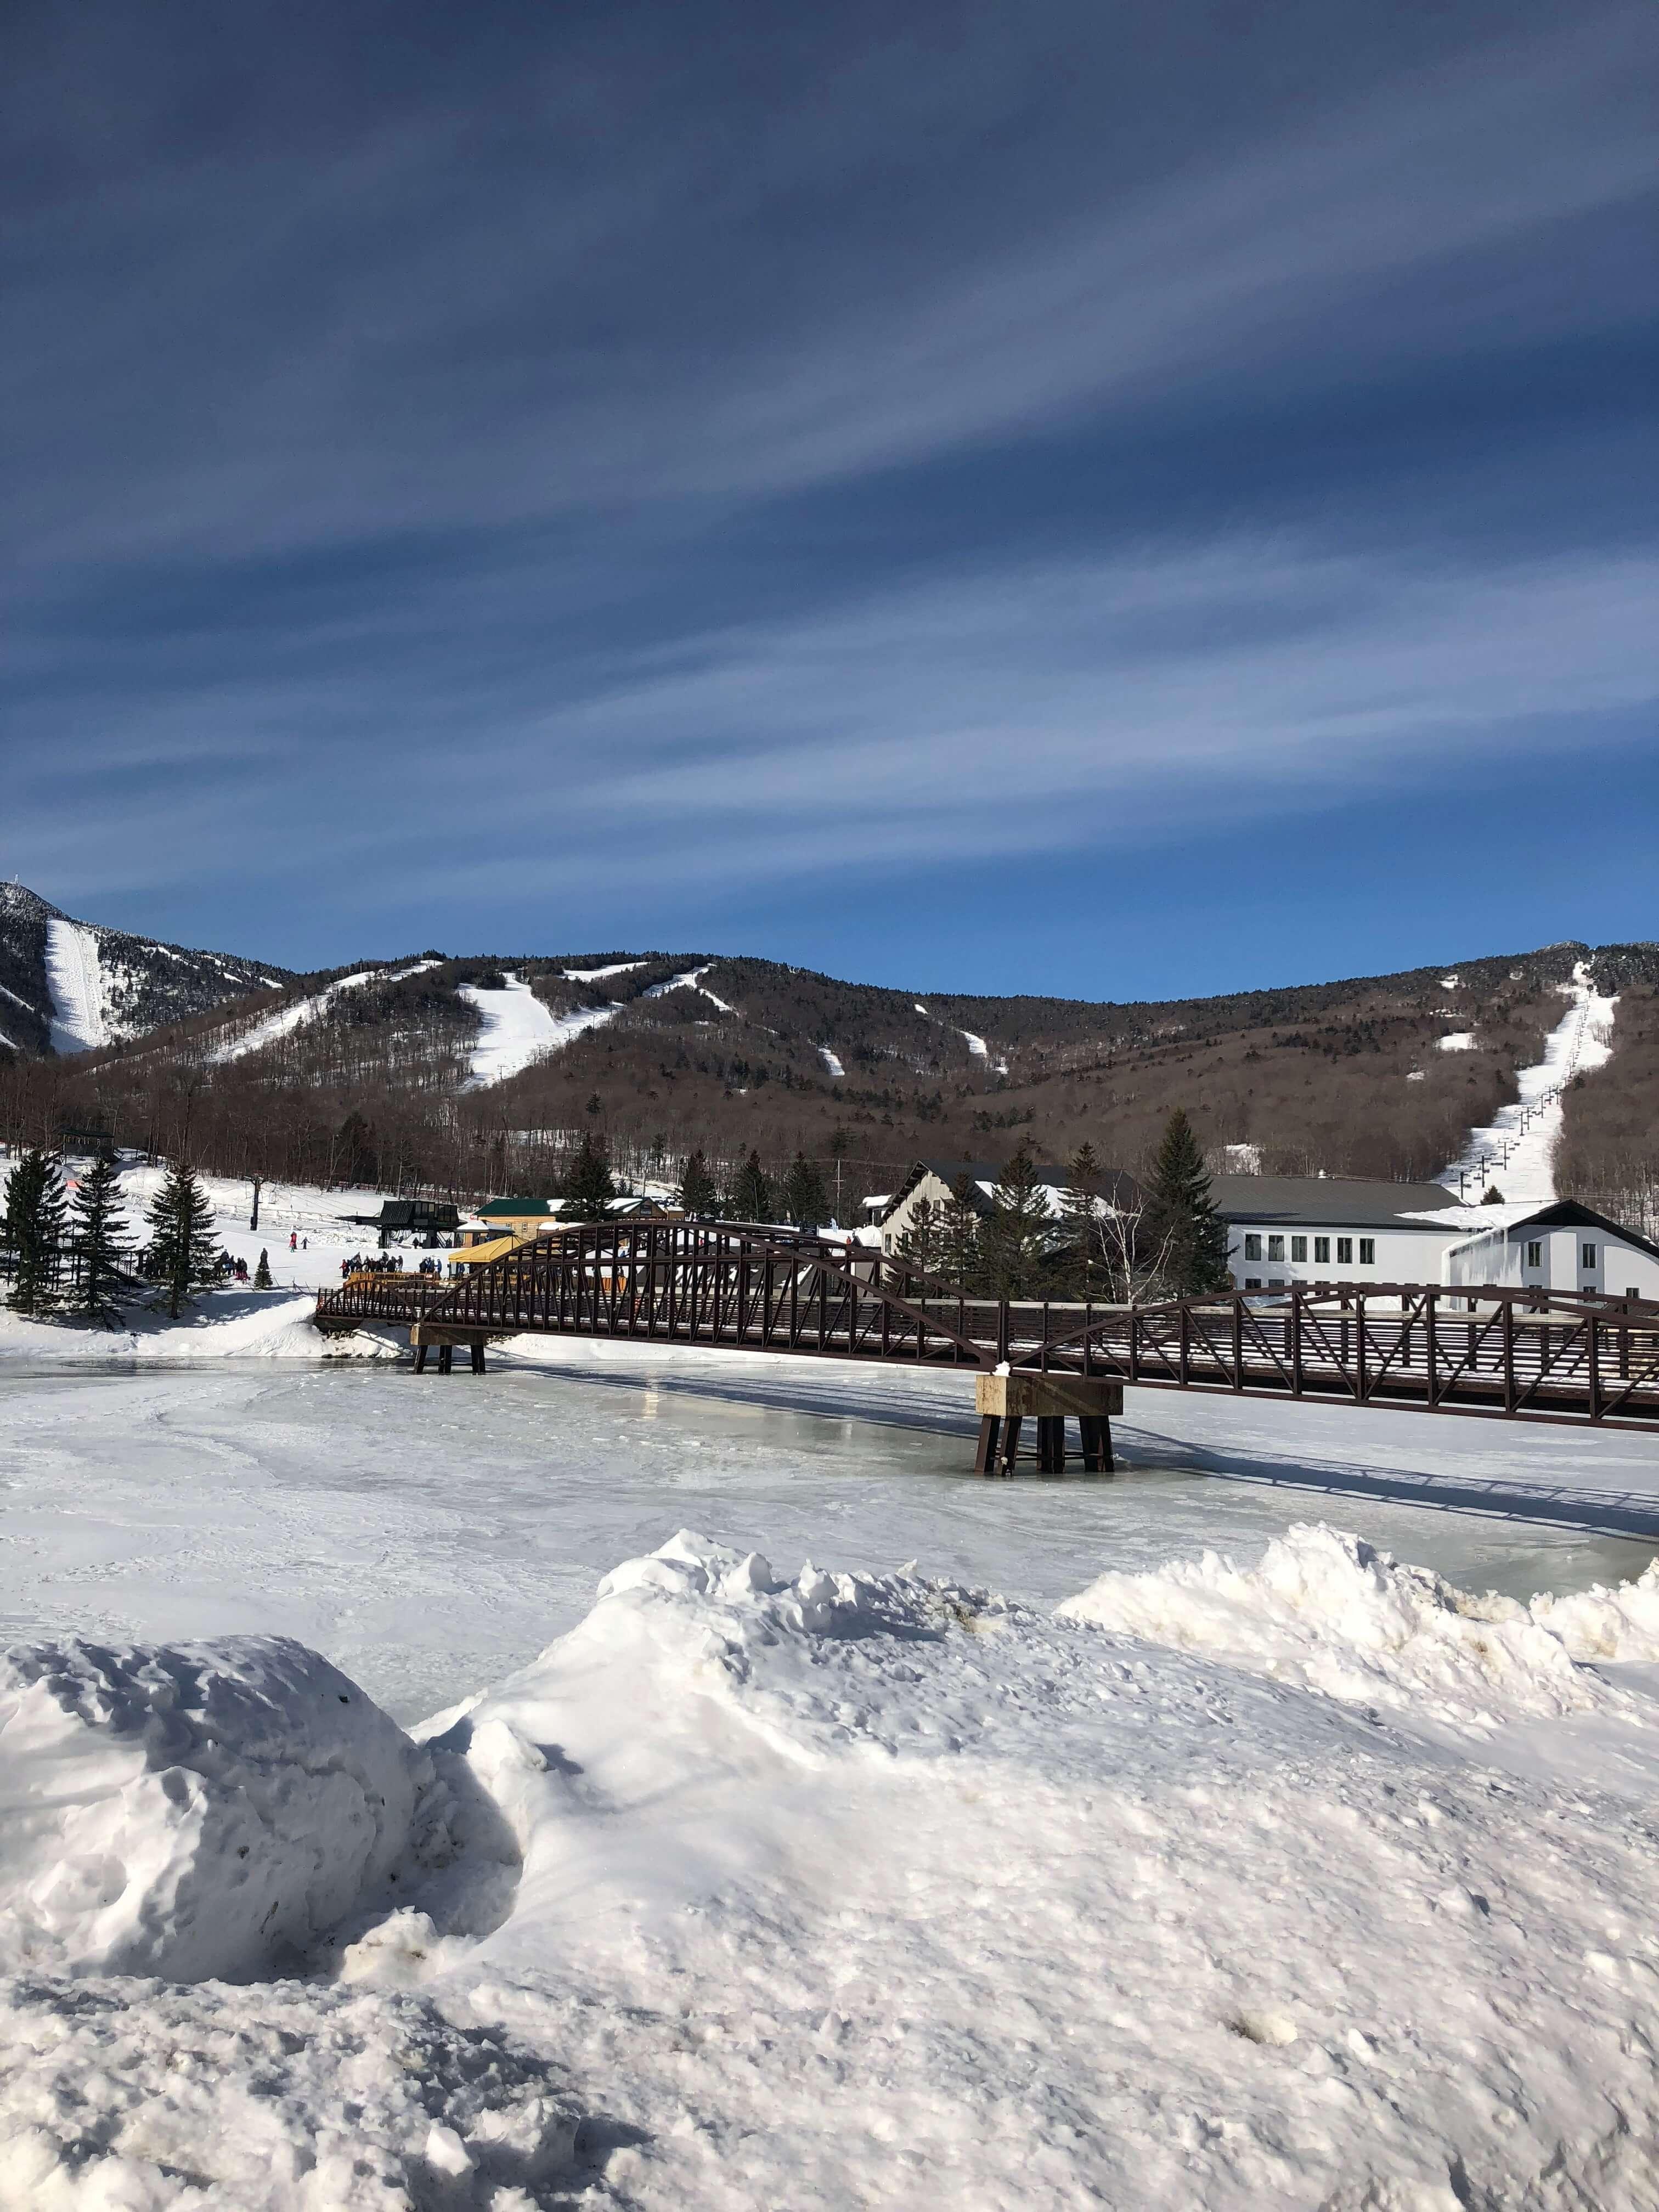 Killington Resort learning to ski as an adult